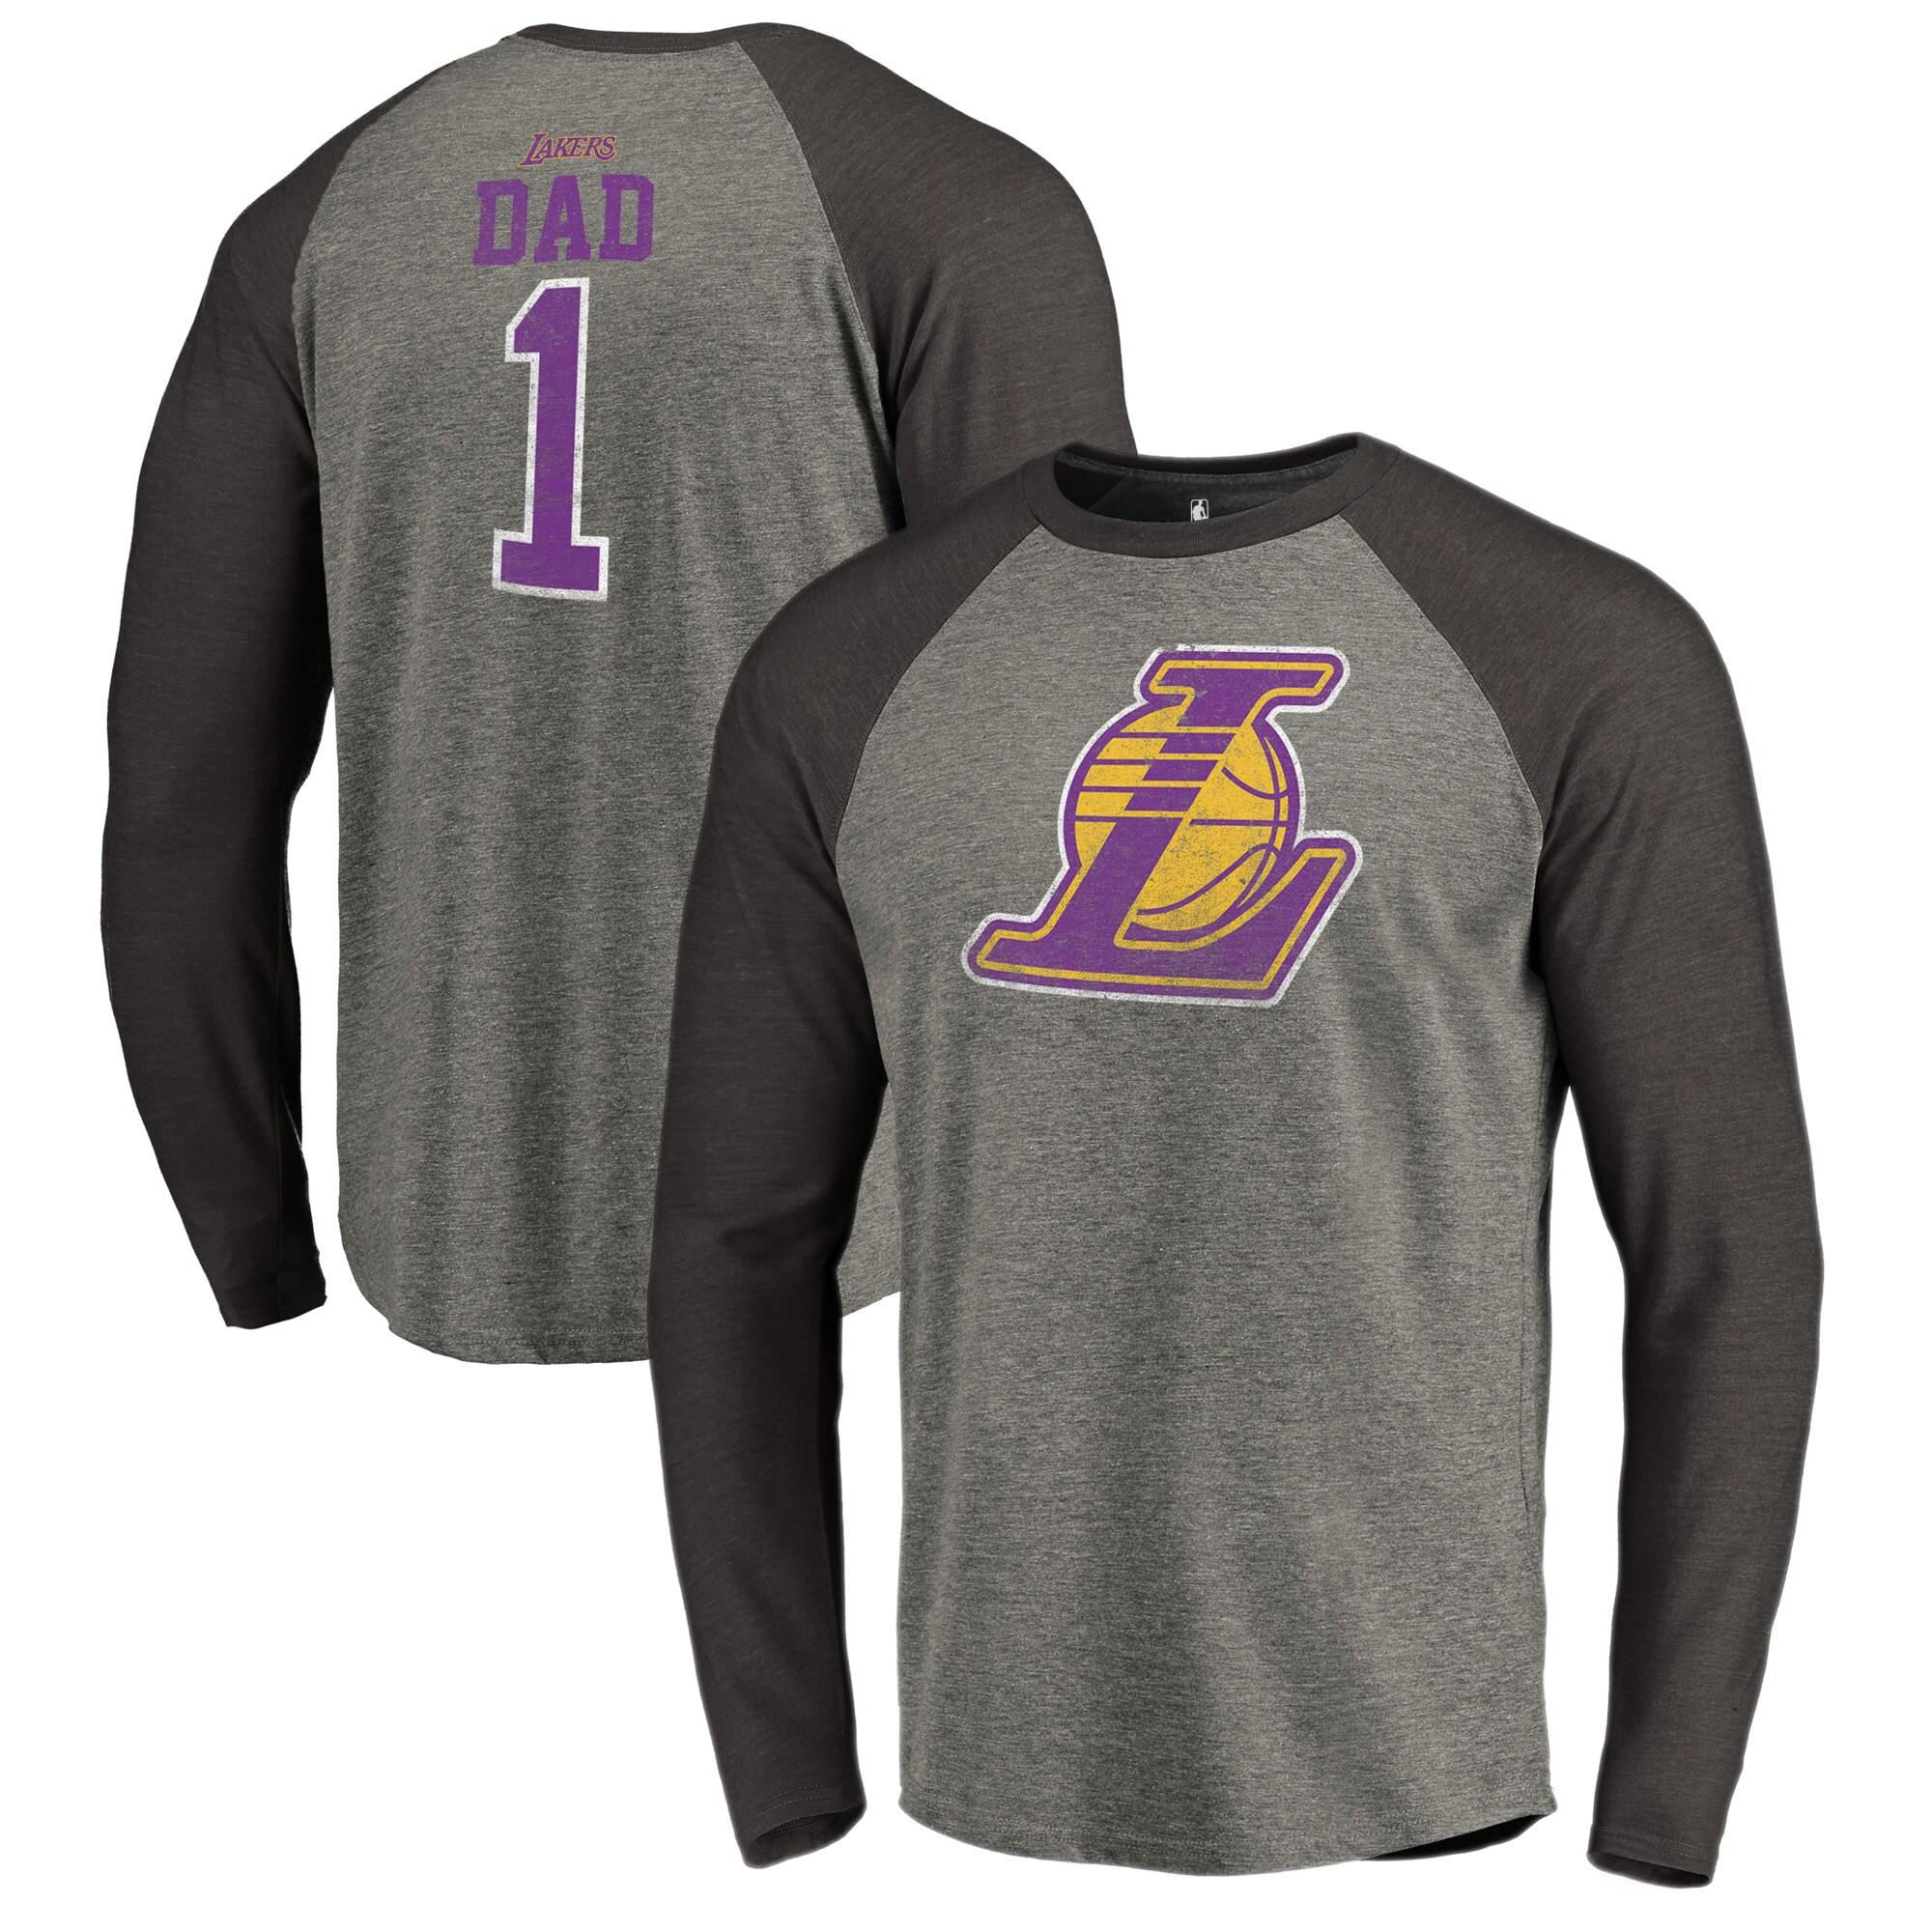 Los Angeles Lakers Fanatics Branded Greatest Dad Long Sleeve Tri-Blend Raglan T-Shirt - Heathered Gray